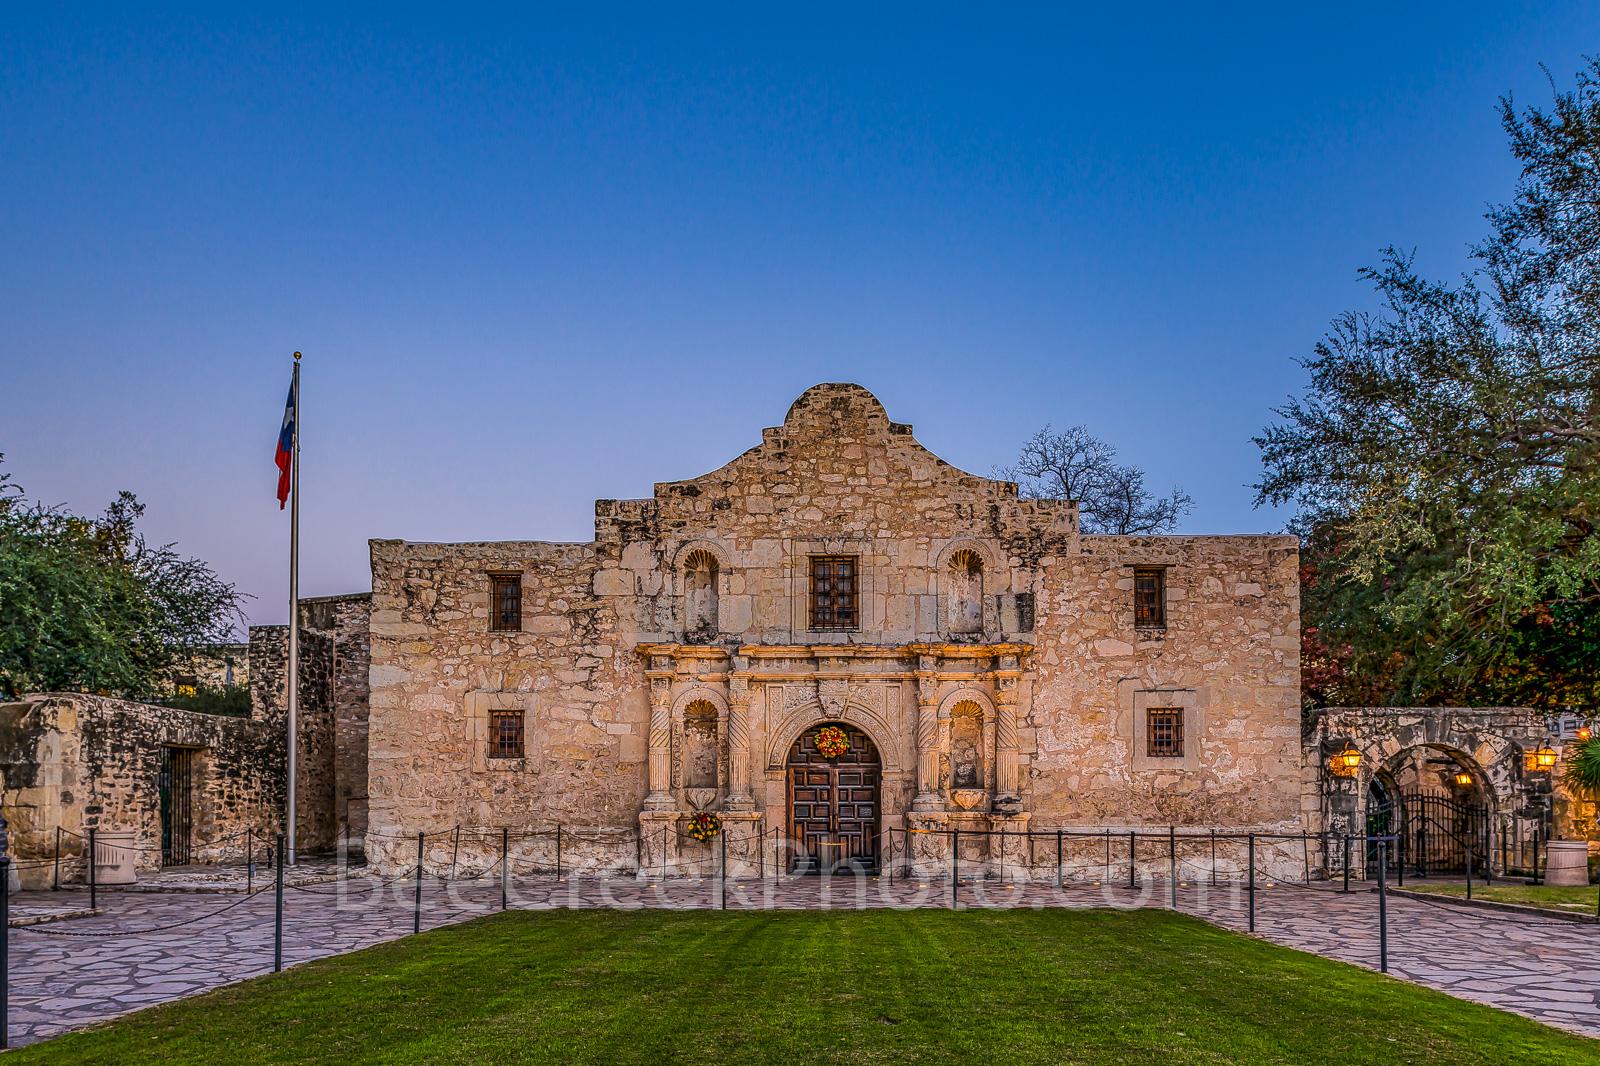 Alamo, San Antonio, Santa Anna, city, cityscape, cityscapes, downtown, dusk, historic, history, landmark, mexico, mission, missions, tourist, twilight, the alamo, , photo